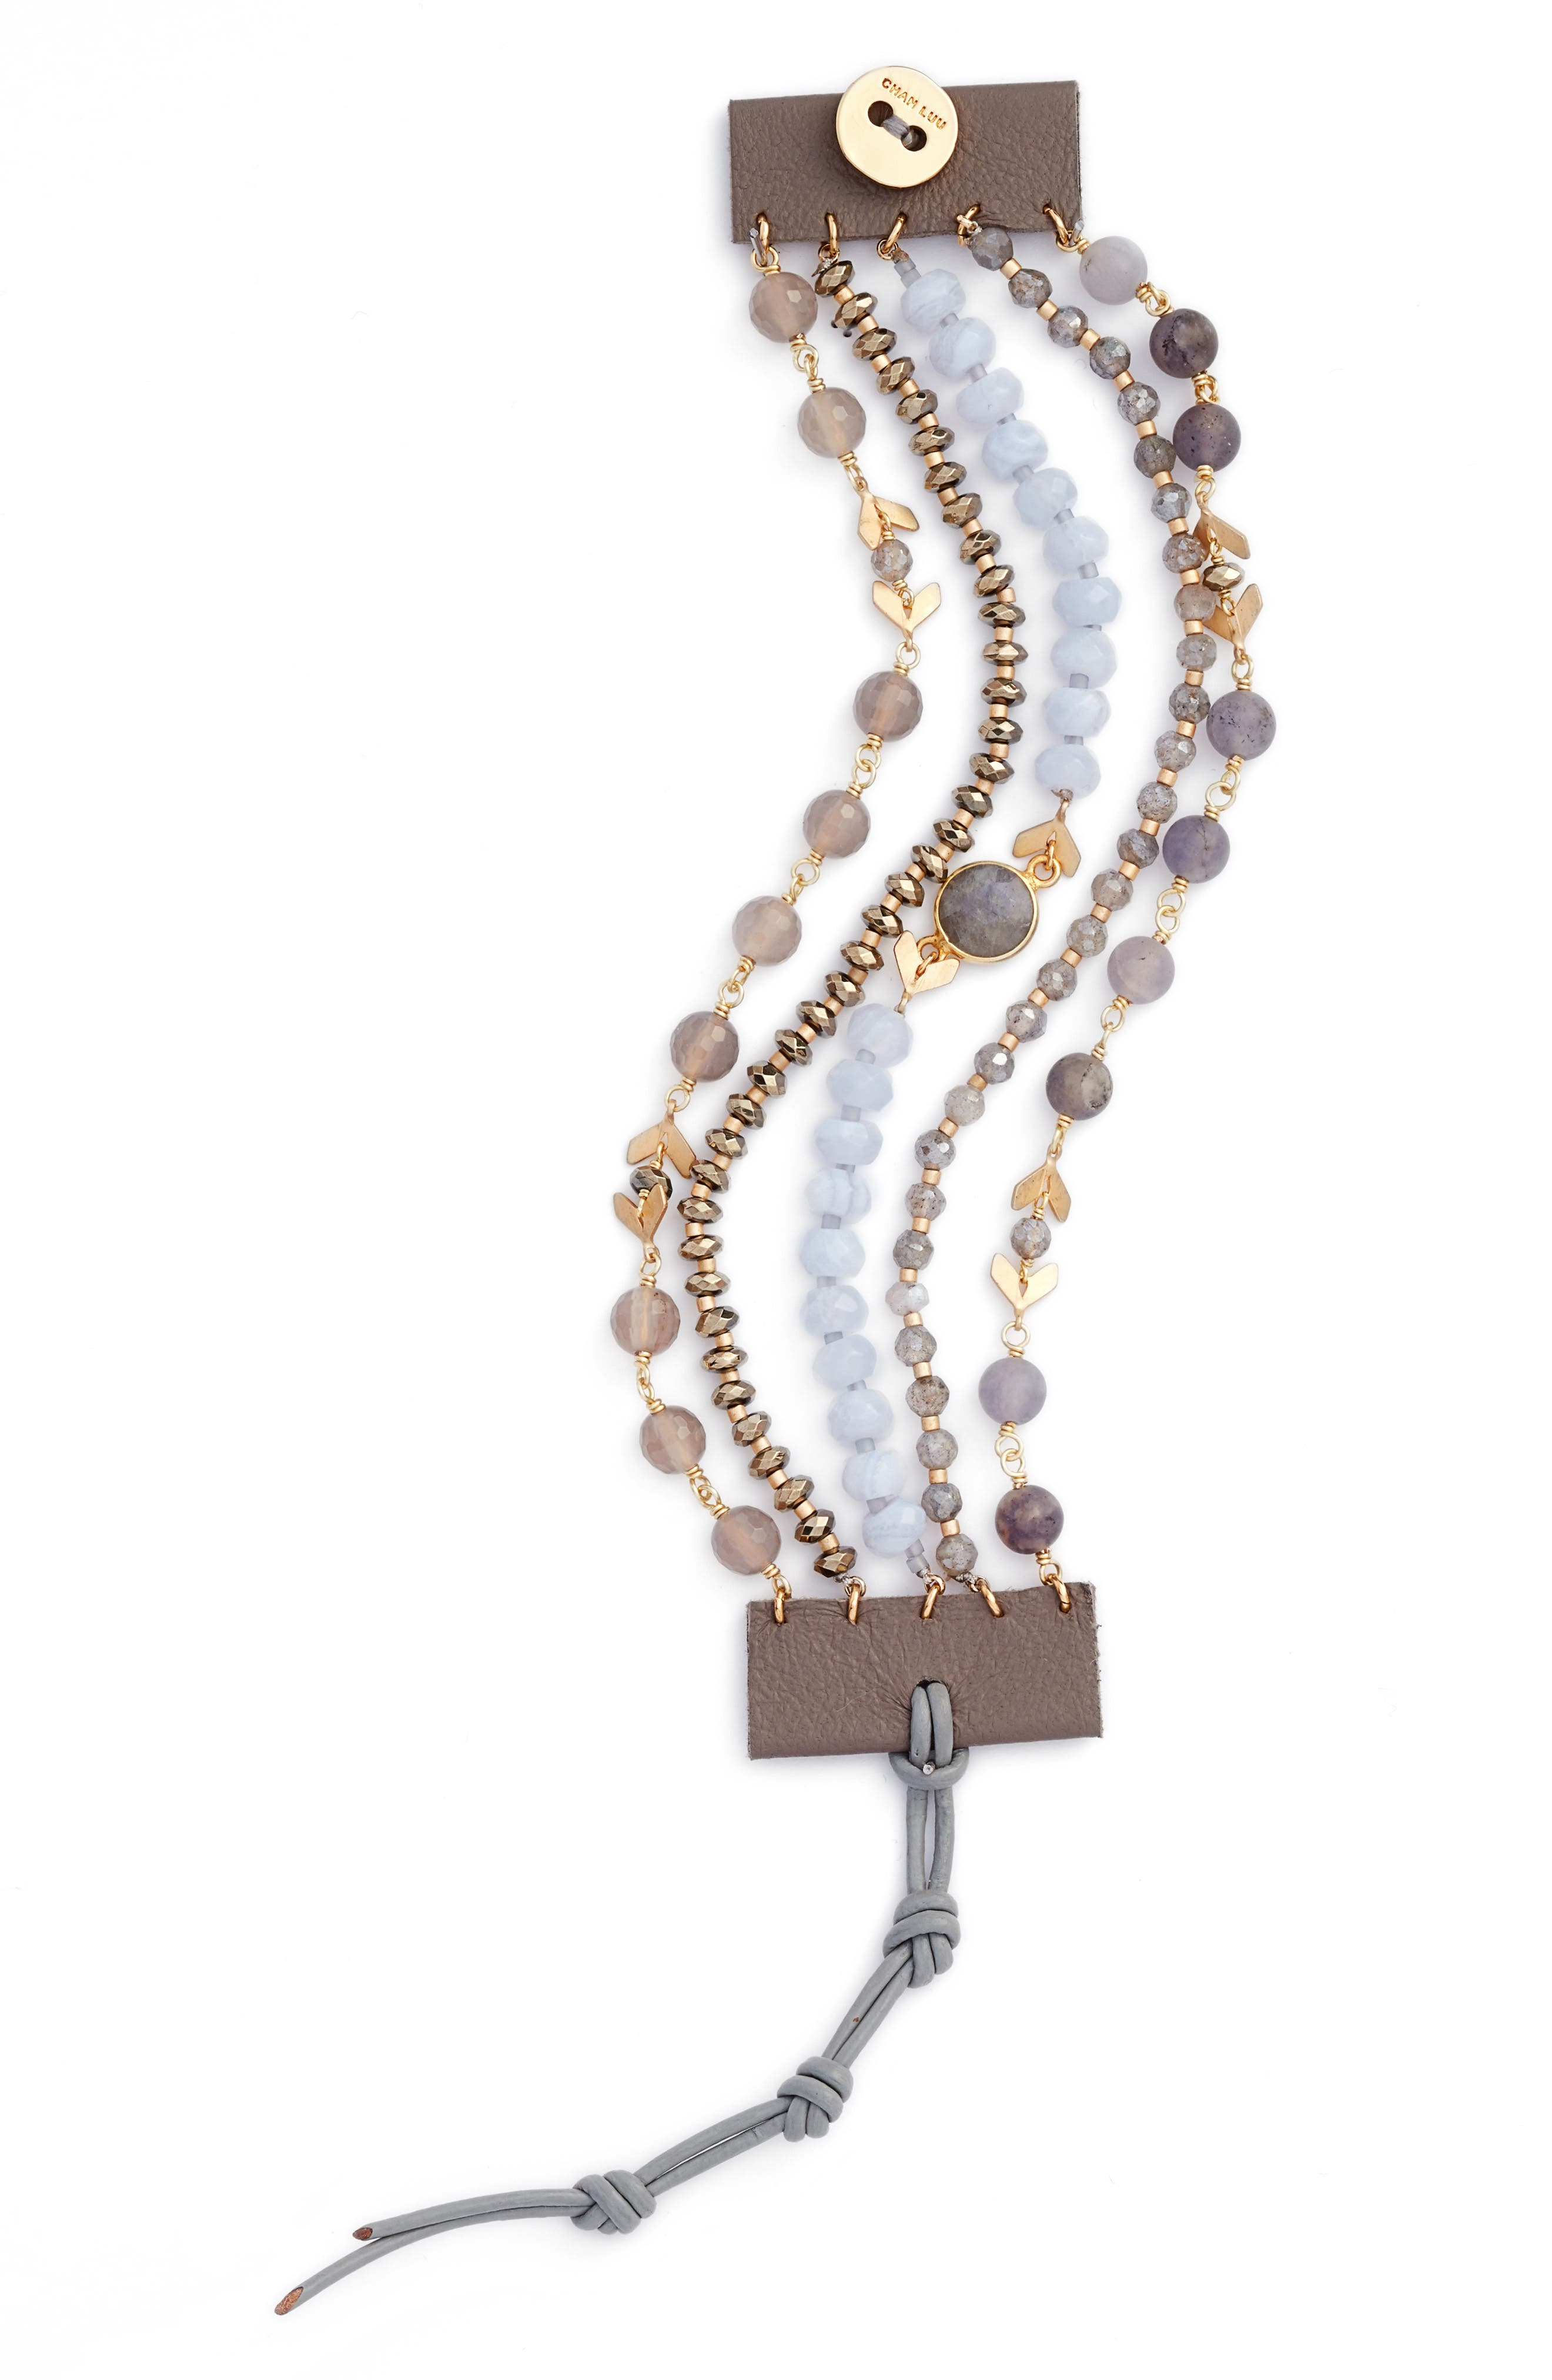 Multistrand Semiprecious Stone Bracelet,                             Main thumbnail 1, color,                             Blue Lace Agate Mix